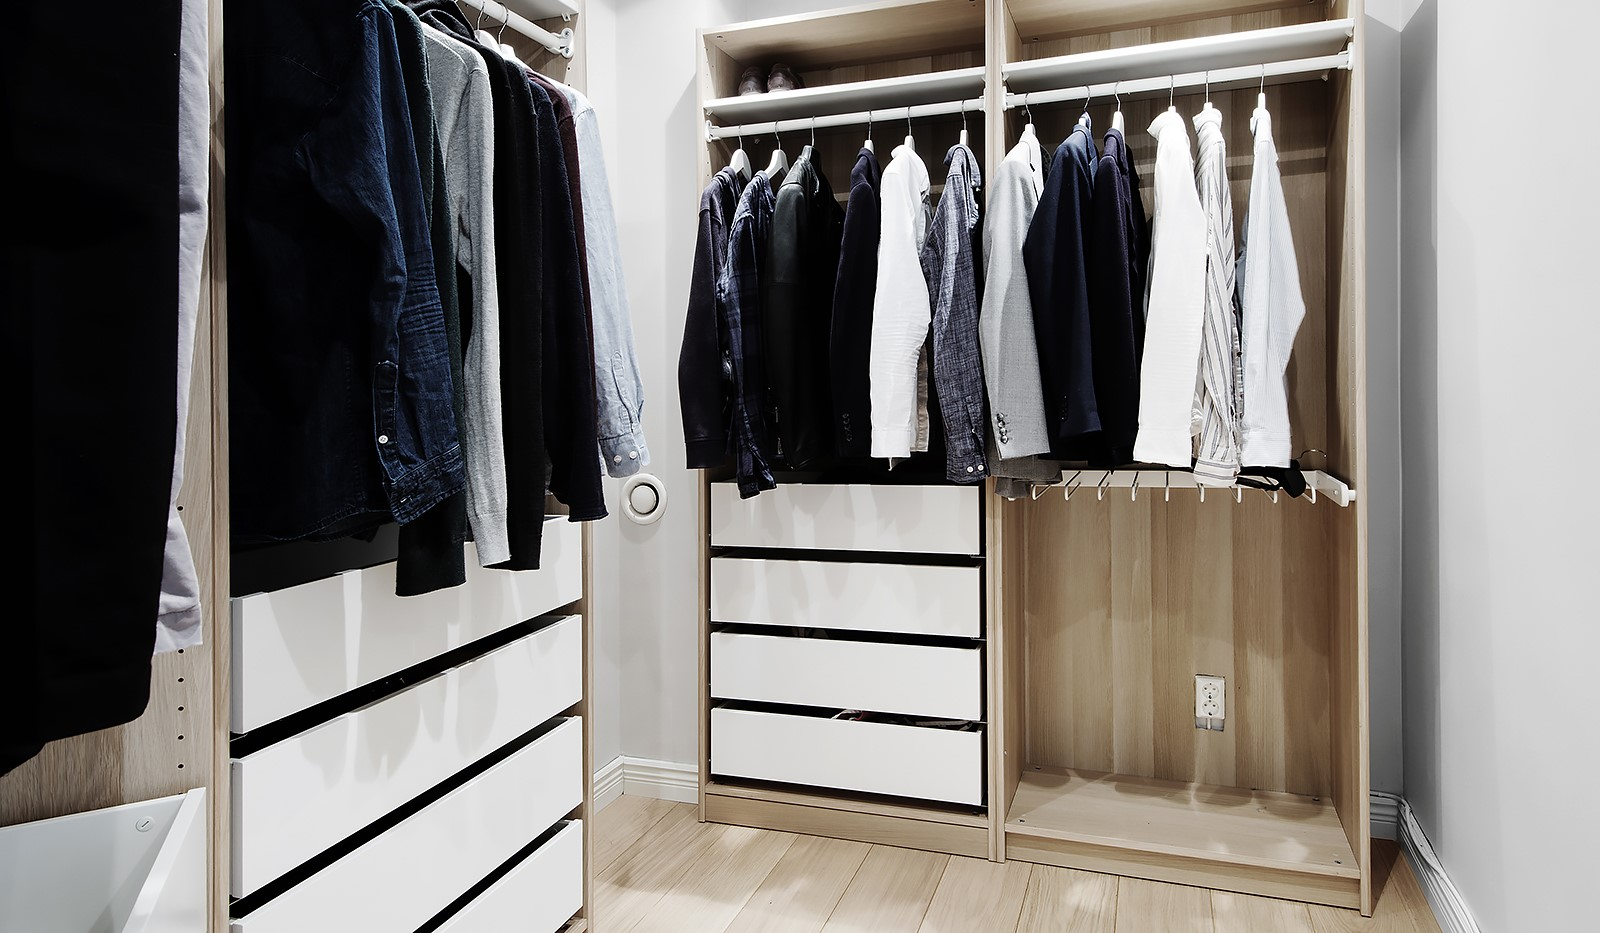 Magnus Ladulåsgatan 49, 4 tr - Walk-in-closet